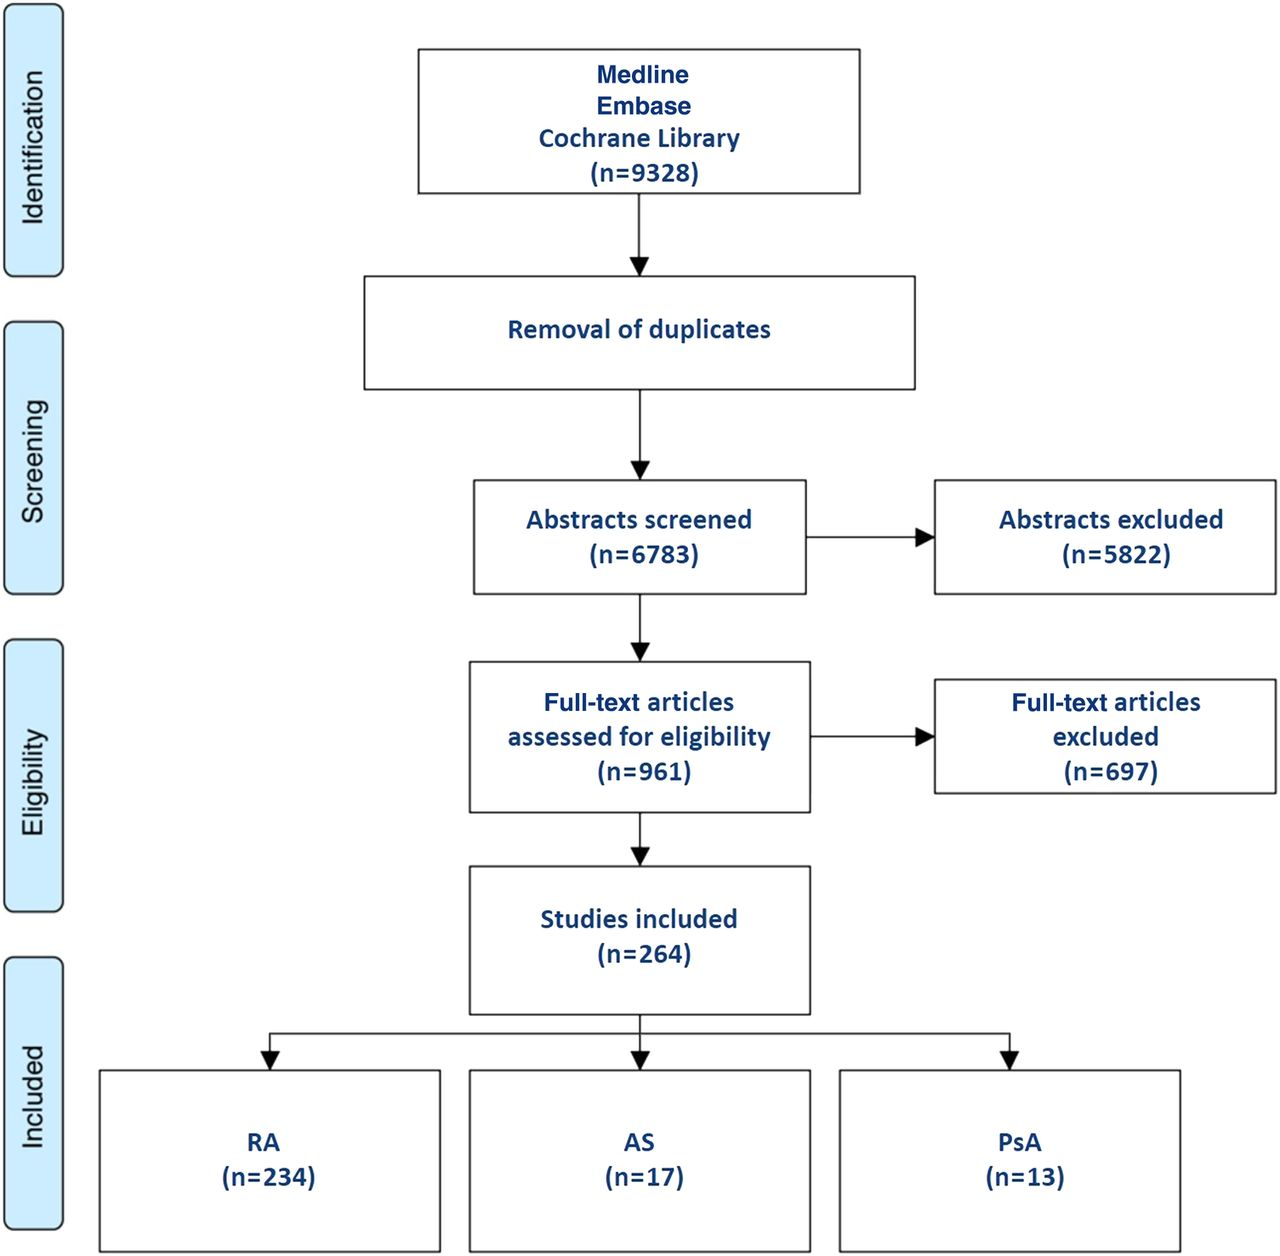 Popular Ann Taylor Loft Size Chart Ann Taylor Size Chart Hips Cardiovascular Disease Risk Management Download Figure Eular Recommendations houzz 01 Ann Taylor Size Chart